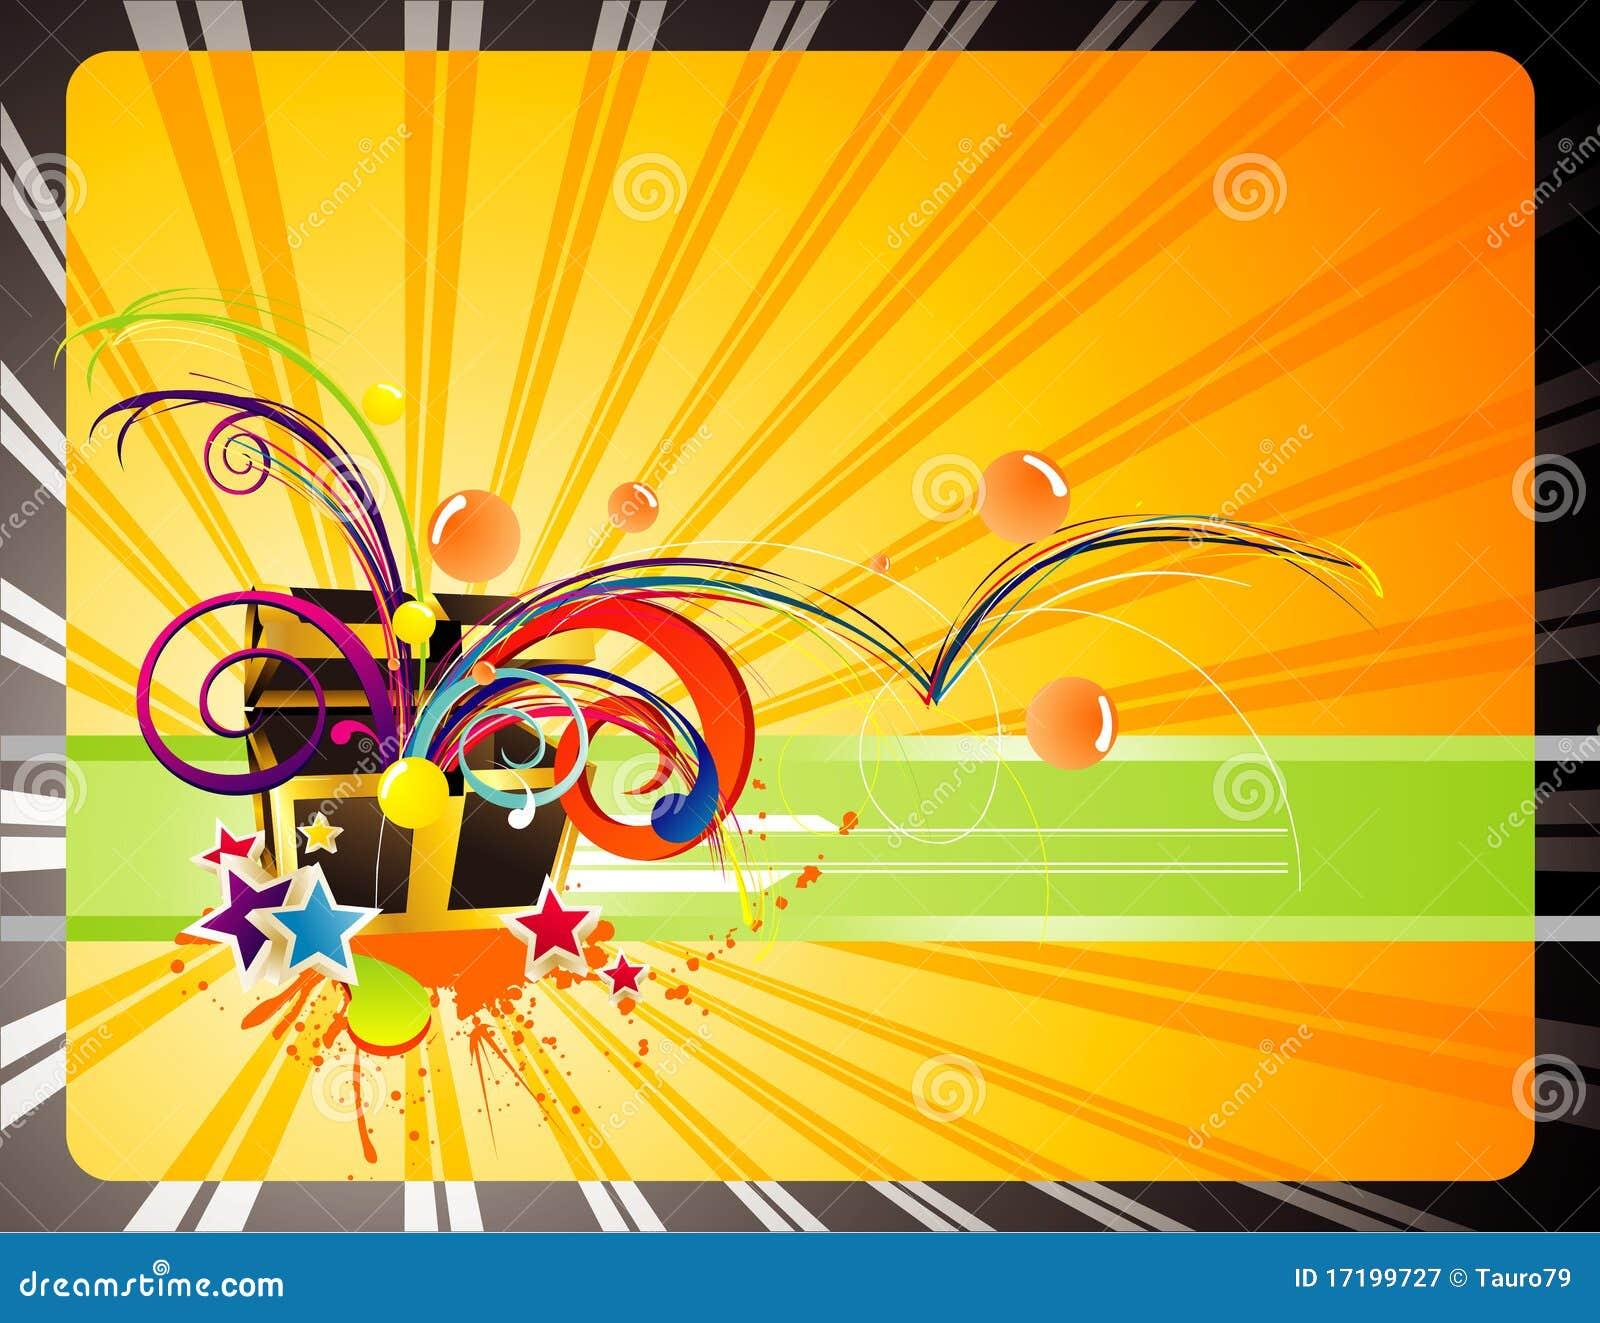 Gifts backgrounds illustration